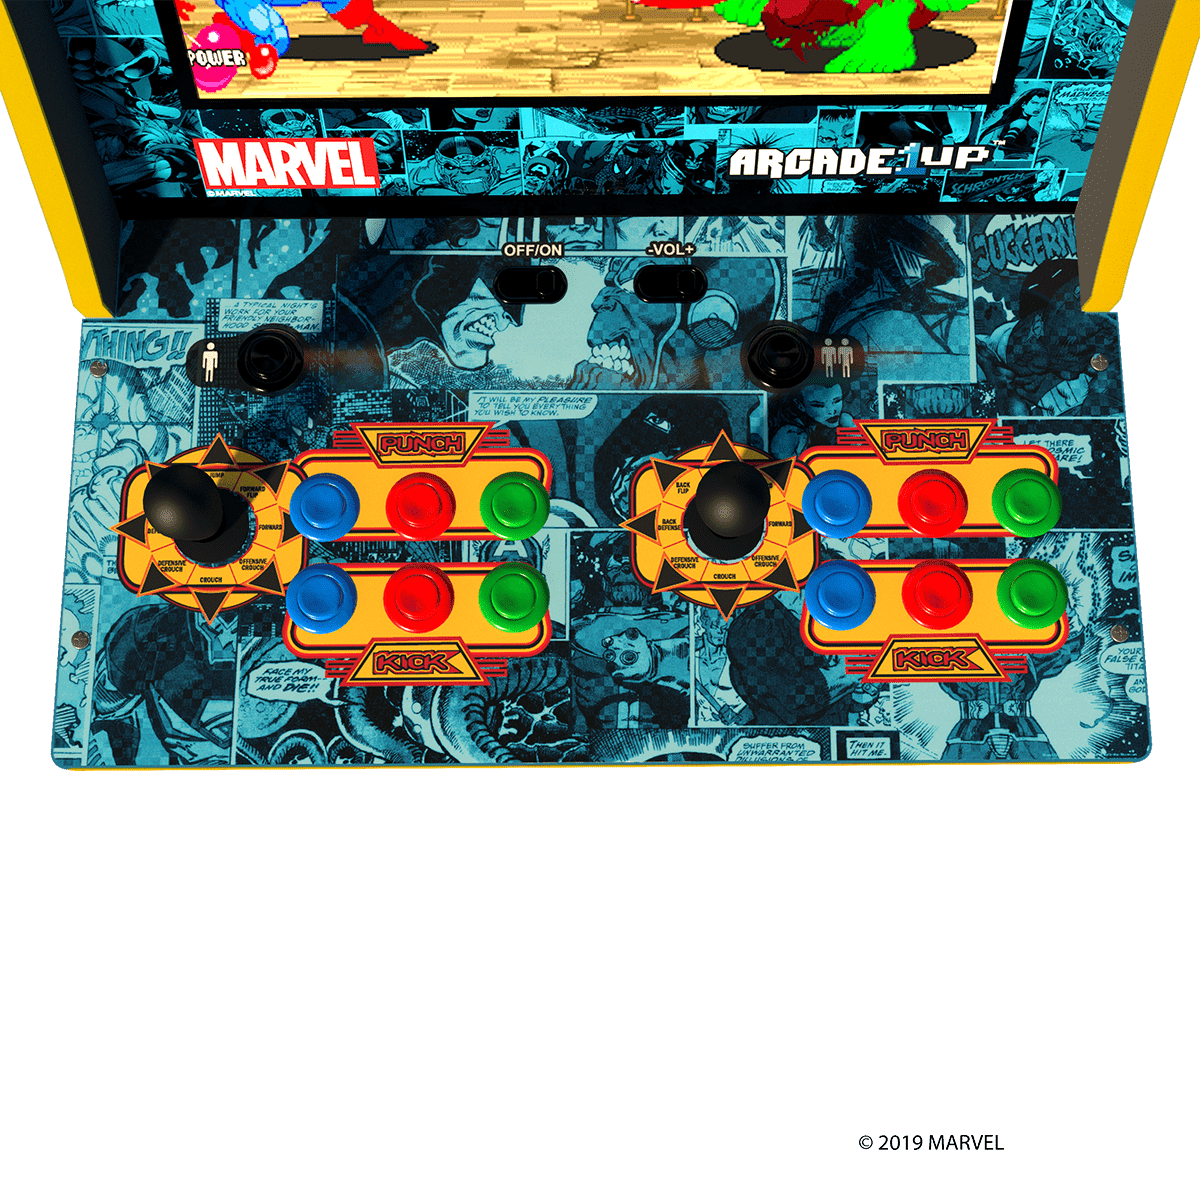 Arcade Up